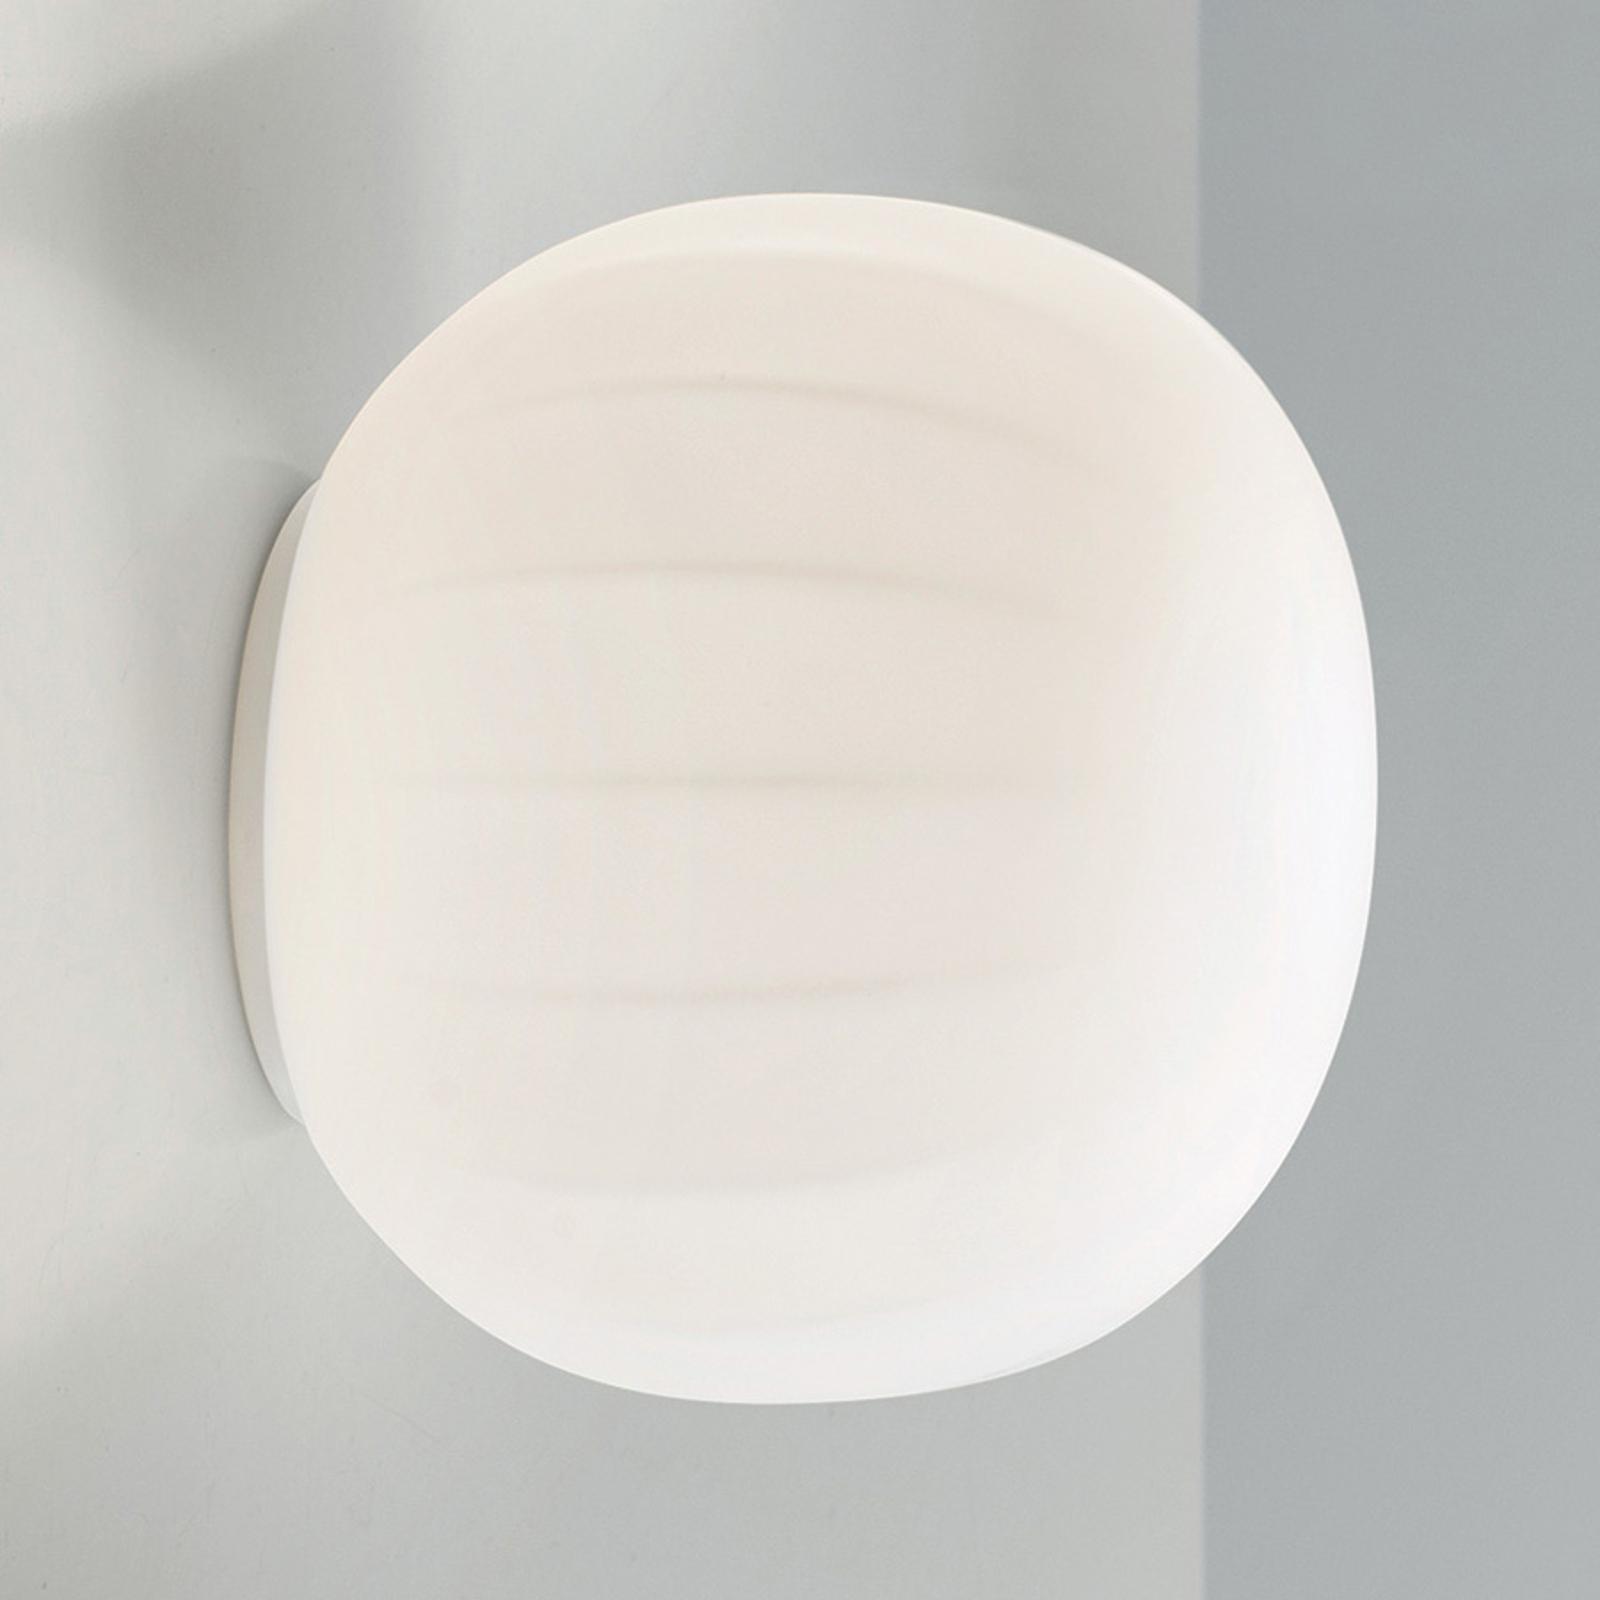 Luceplan Lita Wandlampe Ø 18 cm